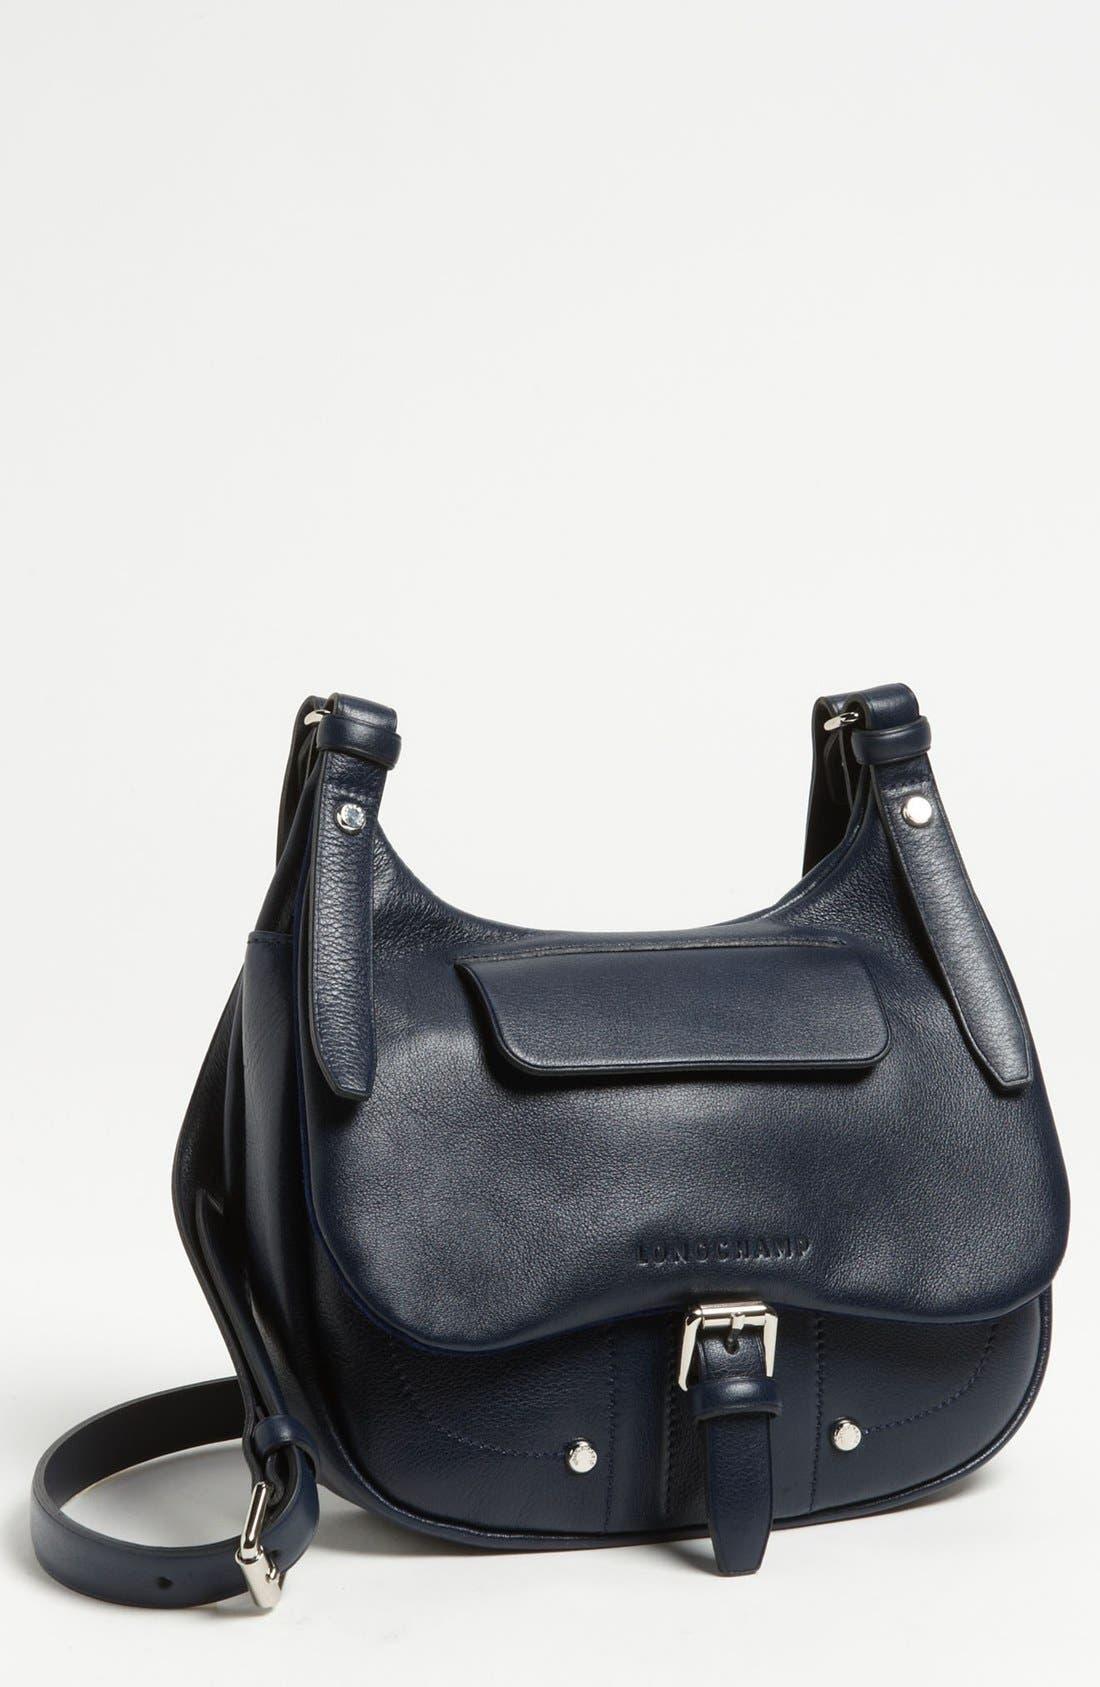 Alternate Image 1 Selected - Longchamp 'Balzane - Small' Crossbody Bag